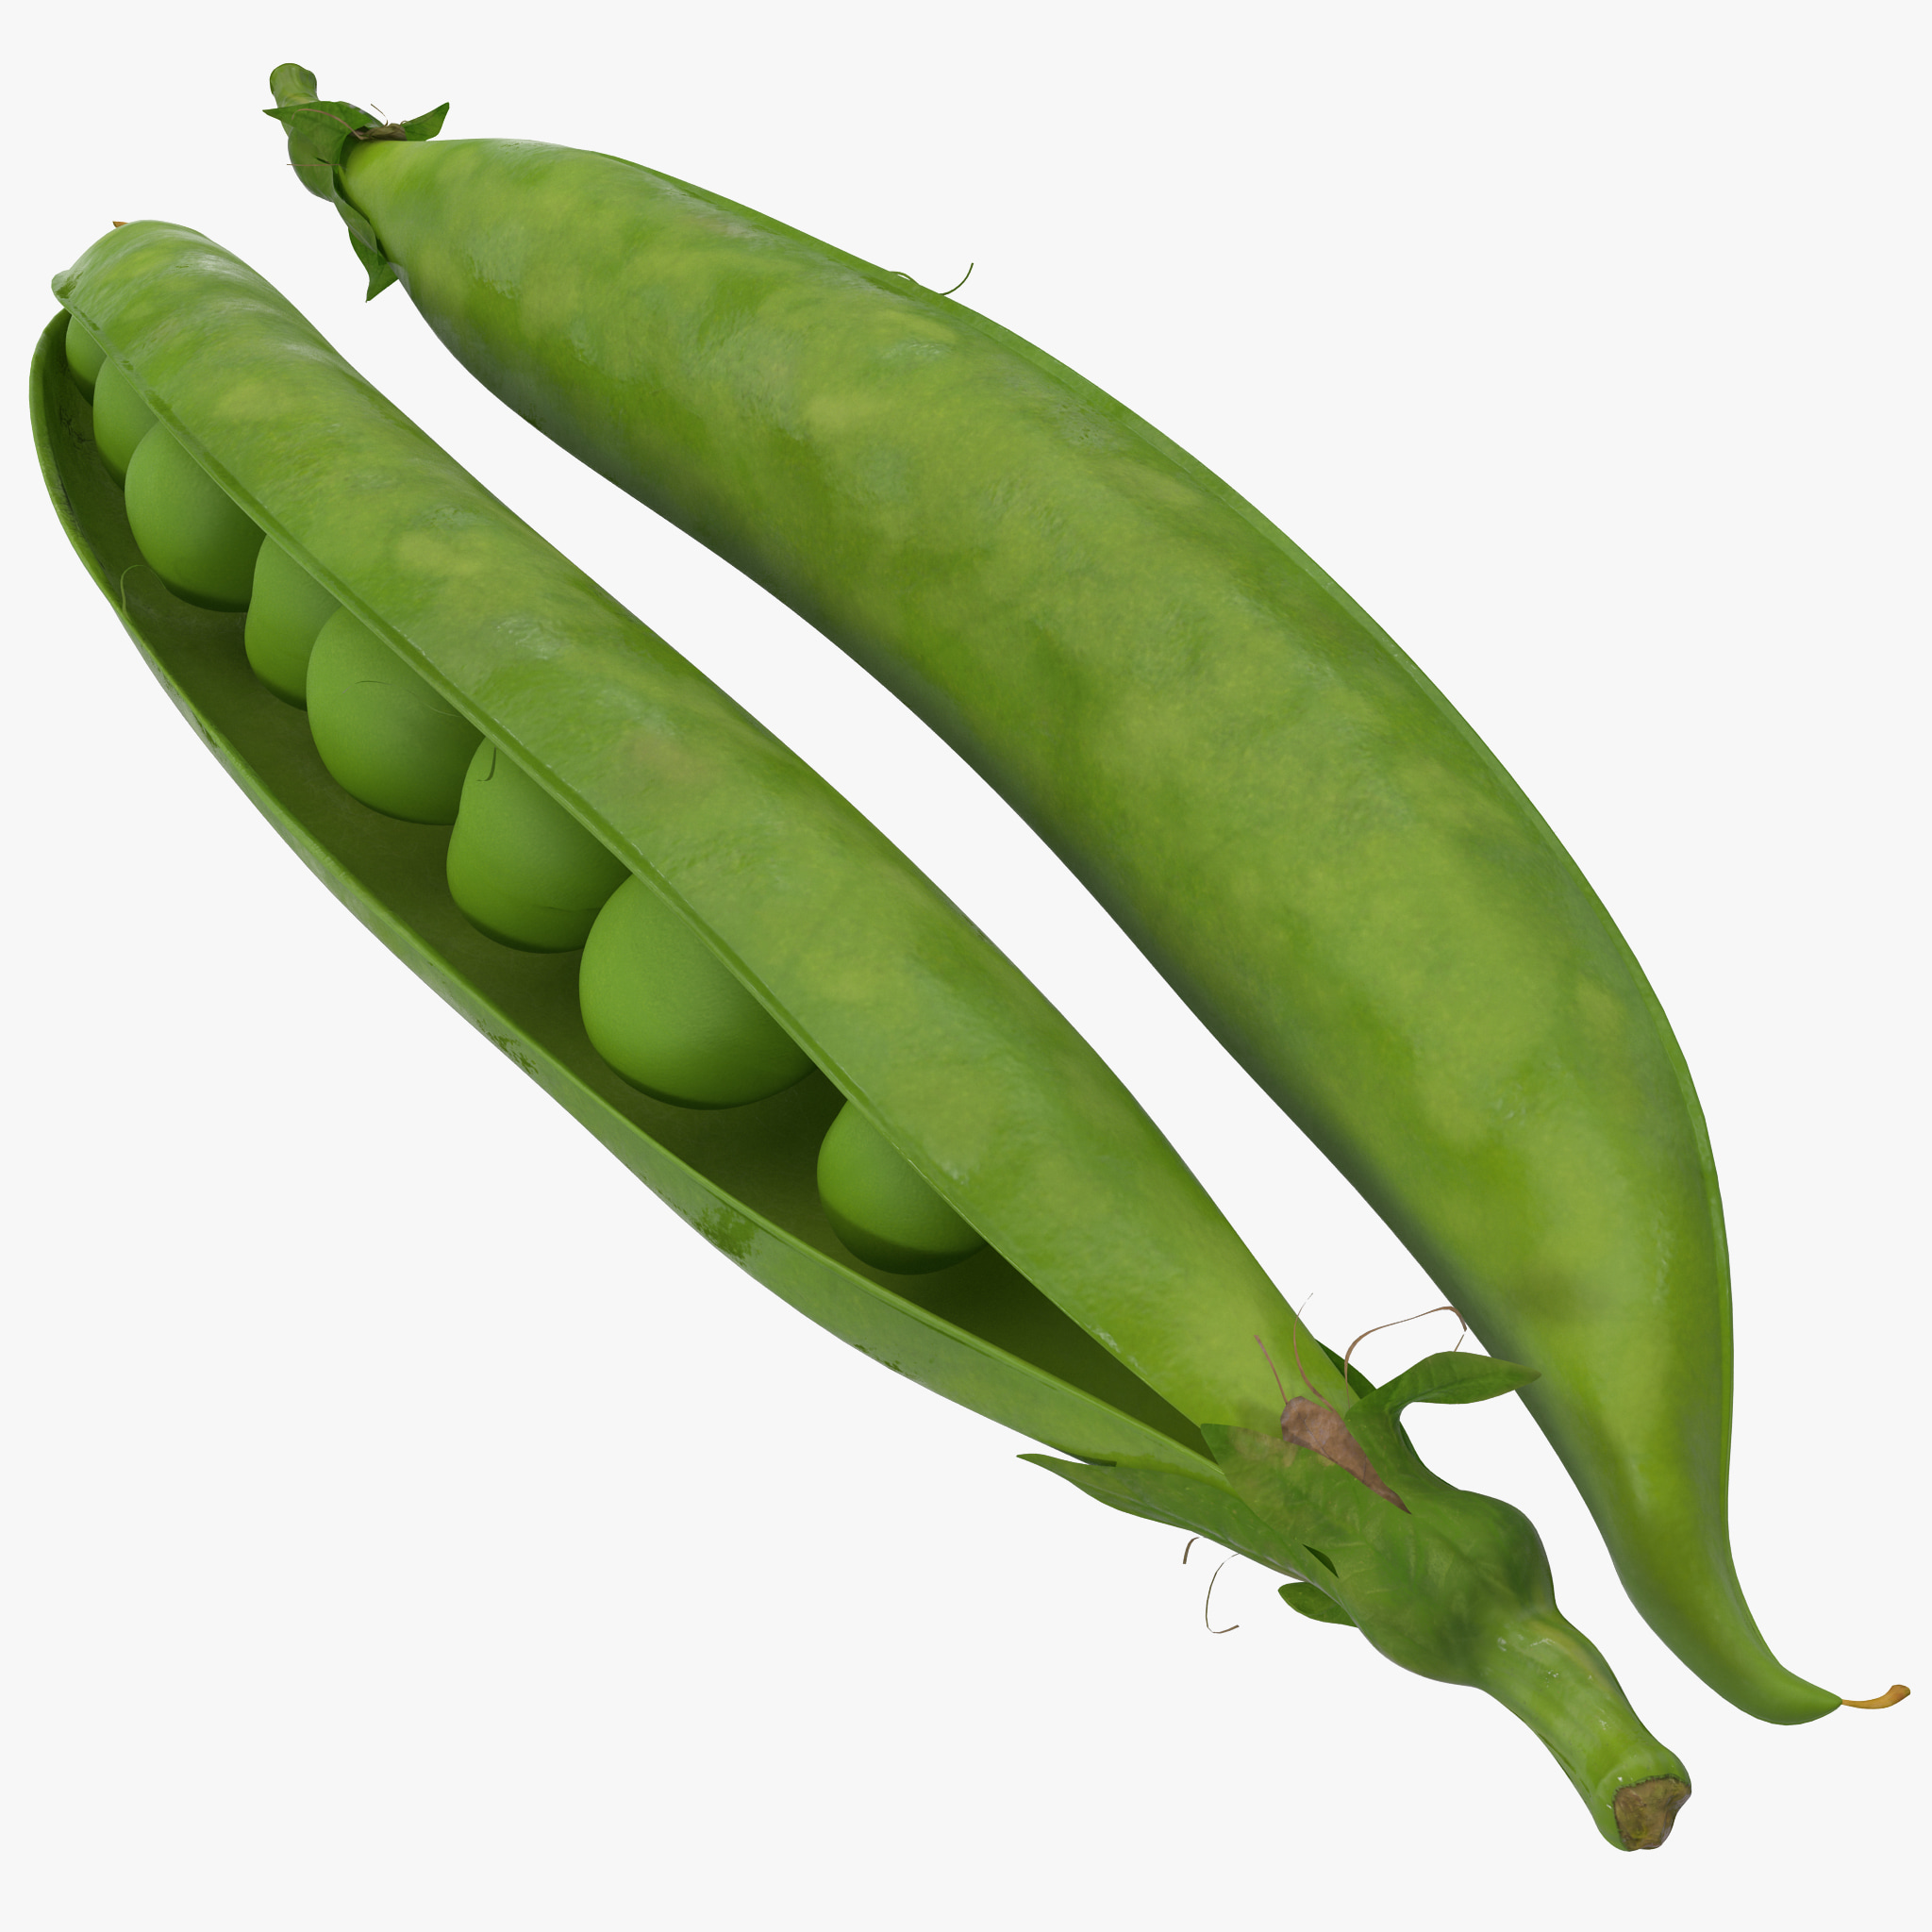 green peas max